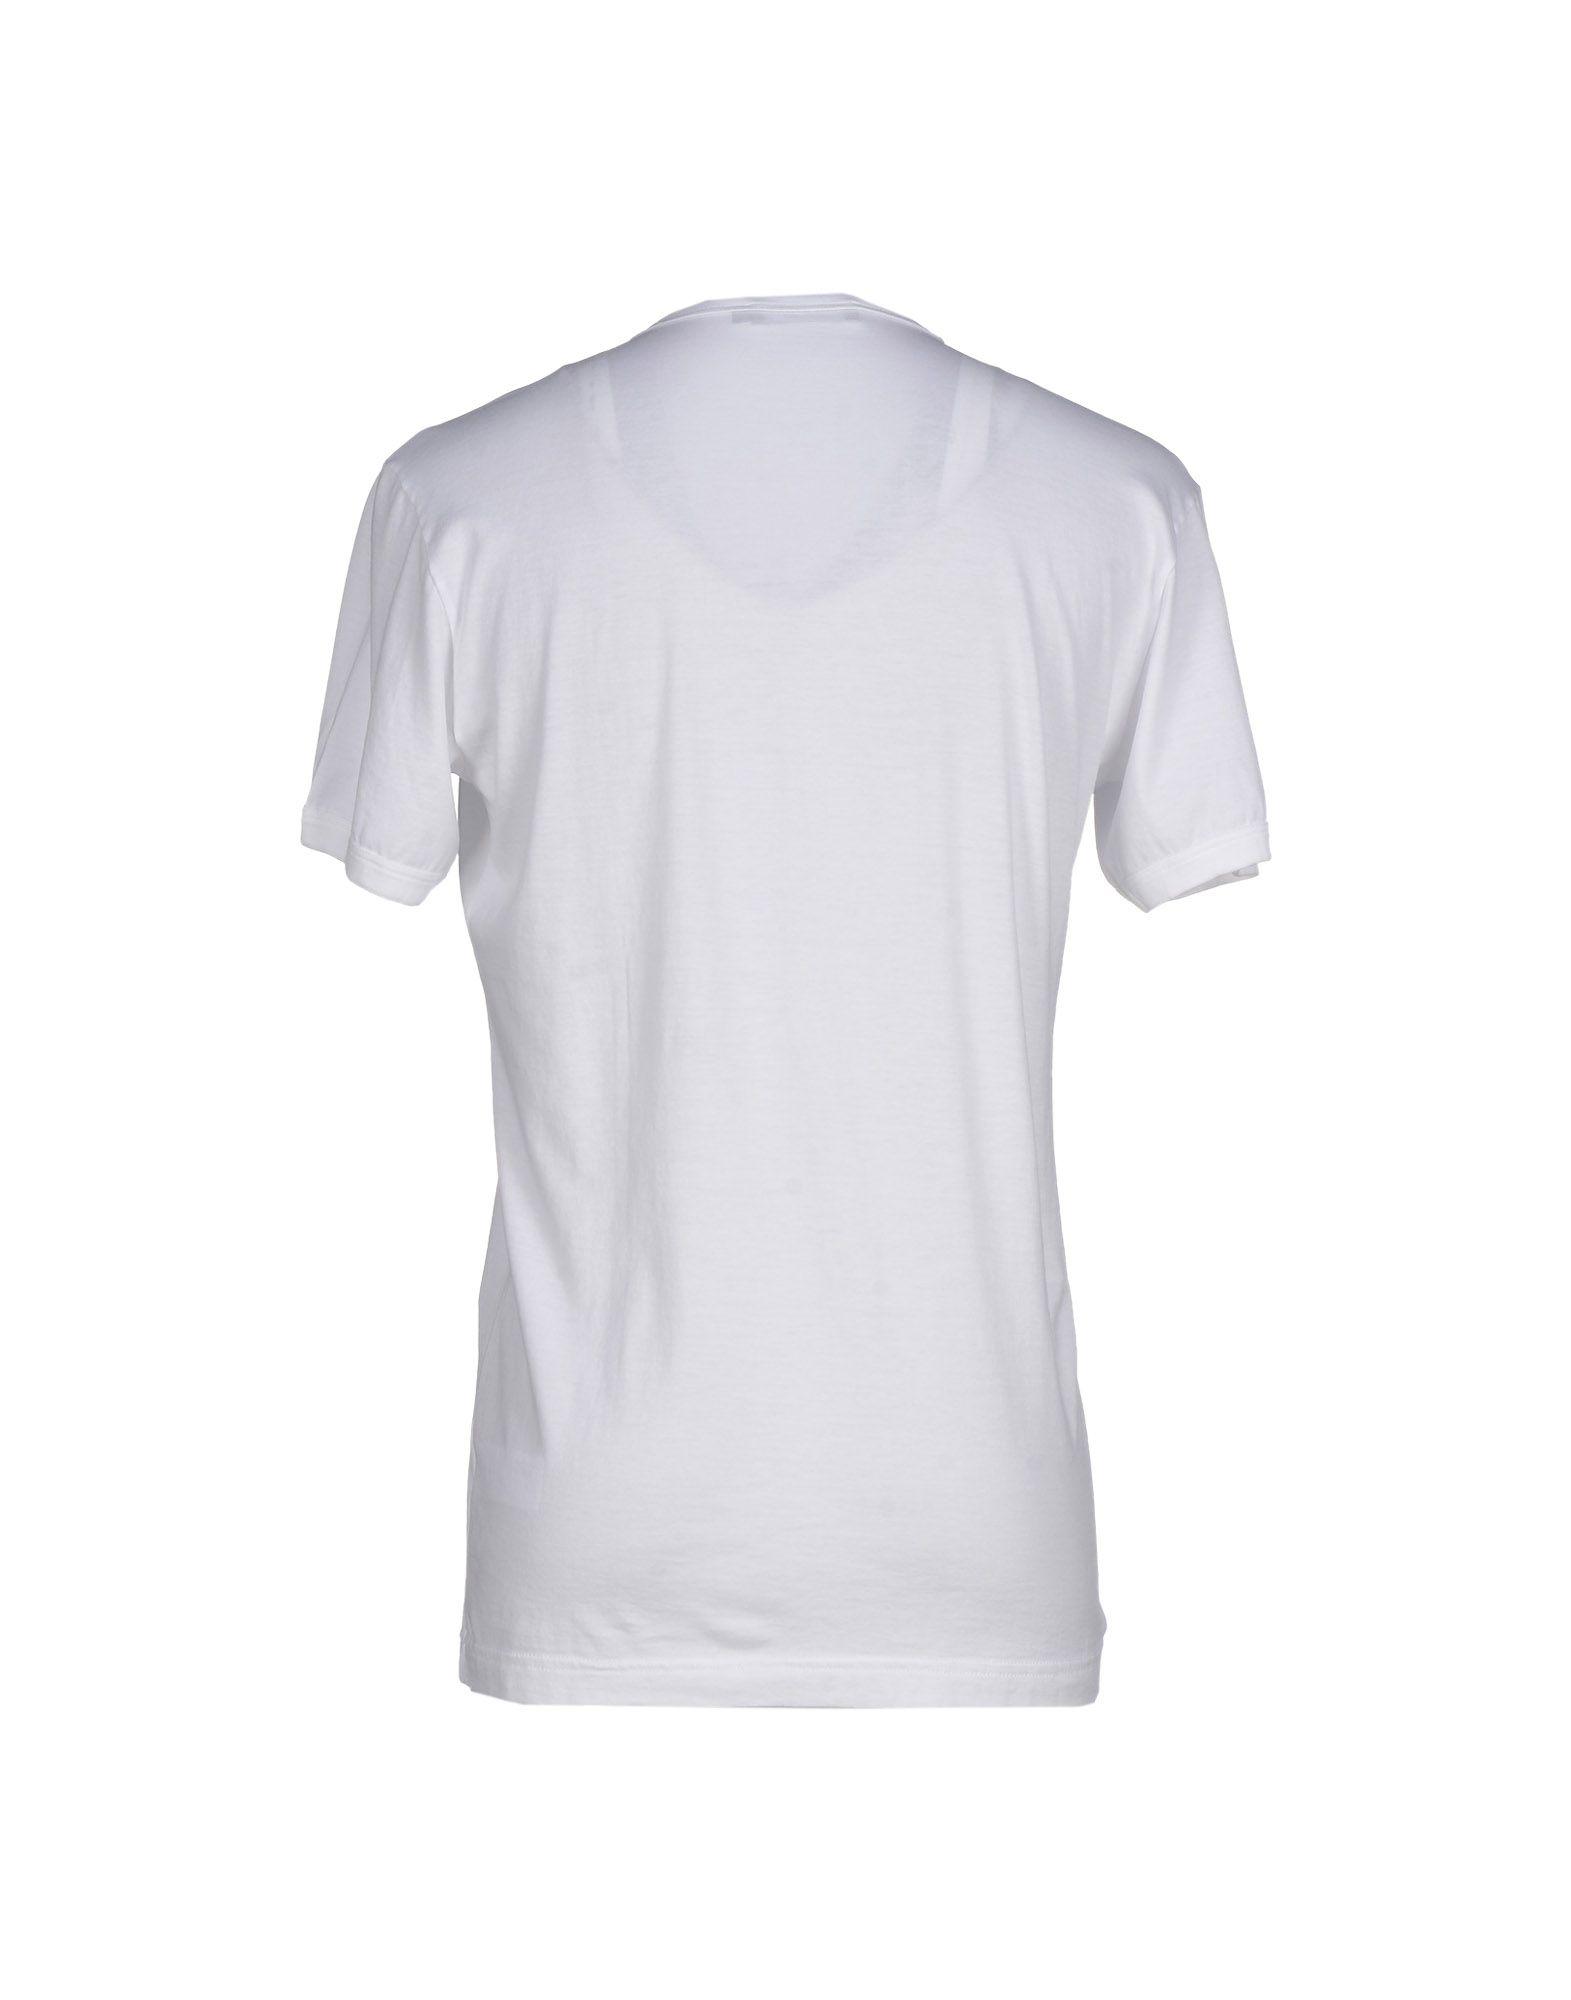 dolce gabbana t shirt in white for men lyst. Black Bedroom Furniture Sets. Home Design Ideas